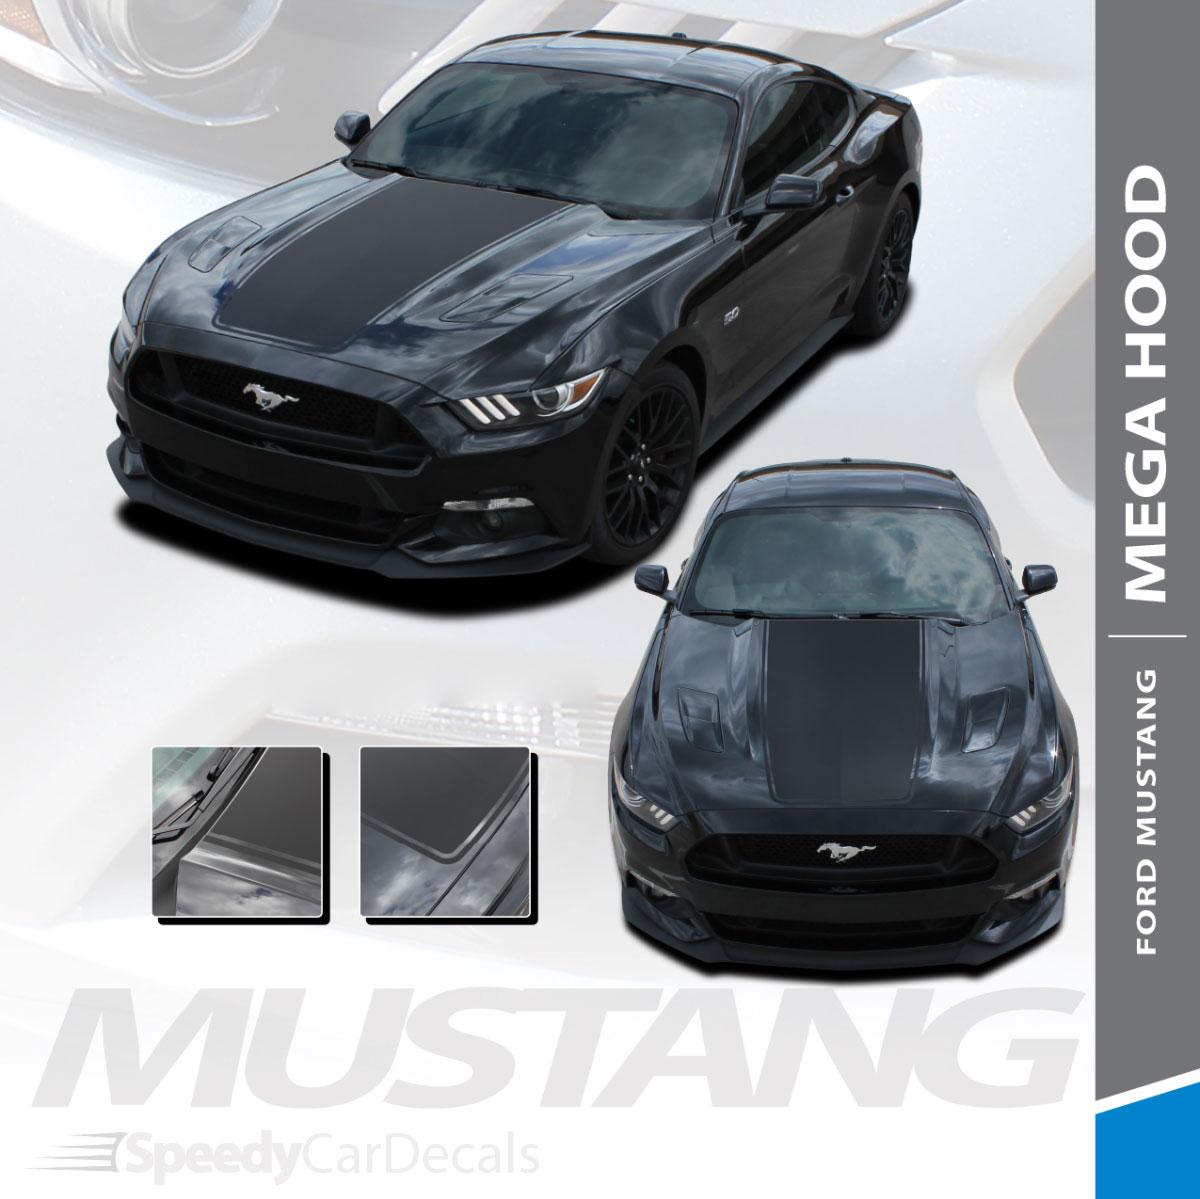 CONTENDER Center Hood Rally Stripes Decals 3M Vinyl 2015-2017 Ford Mustang V8 V6